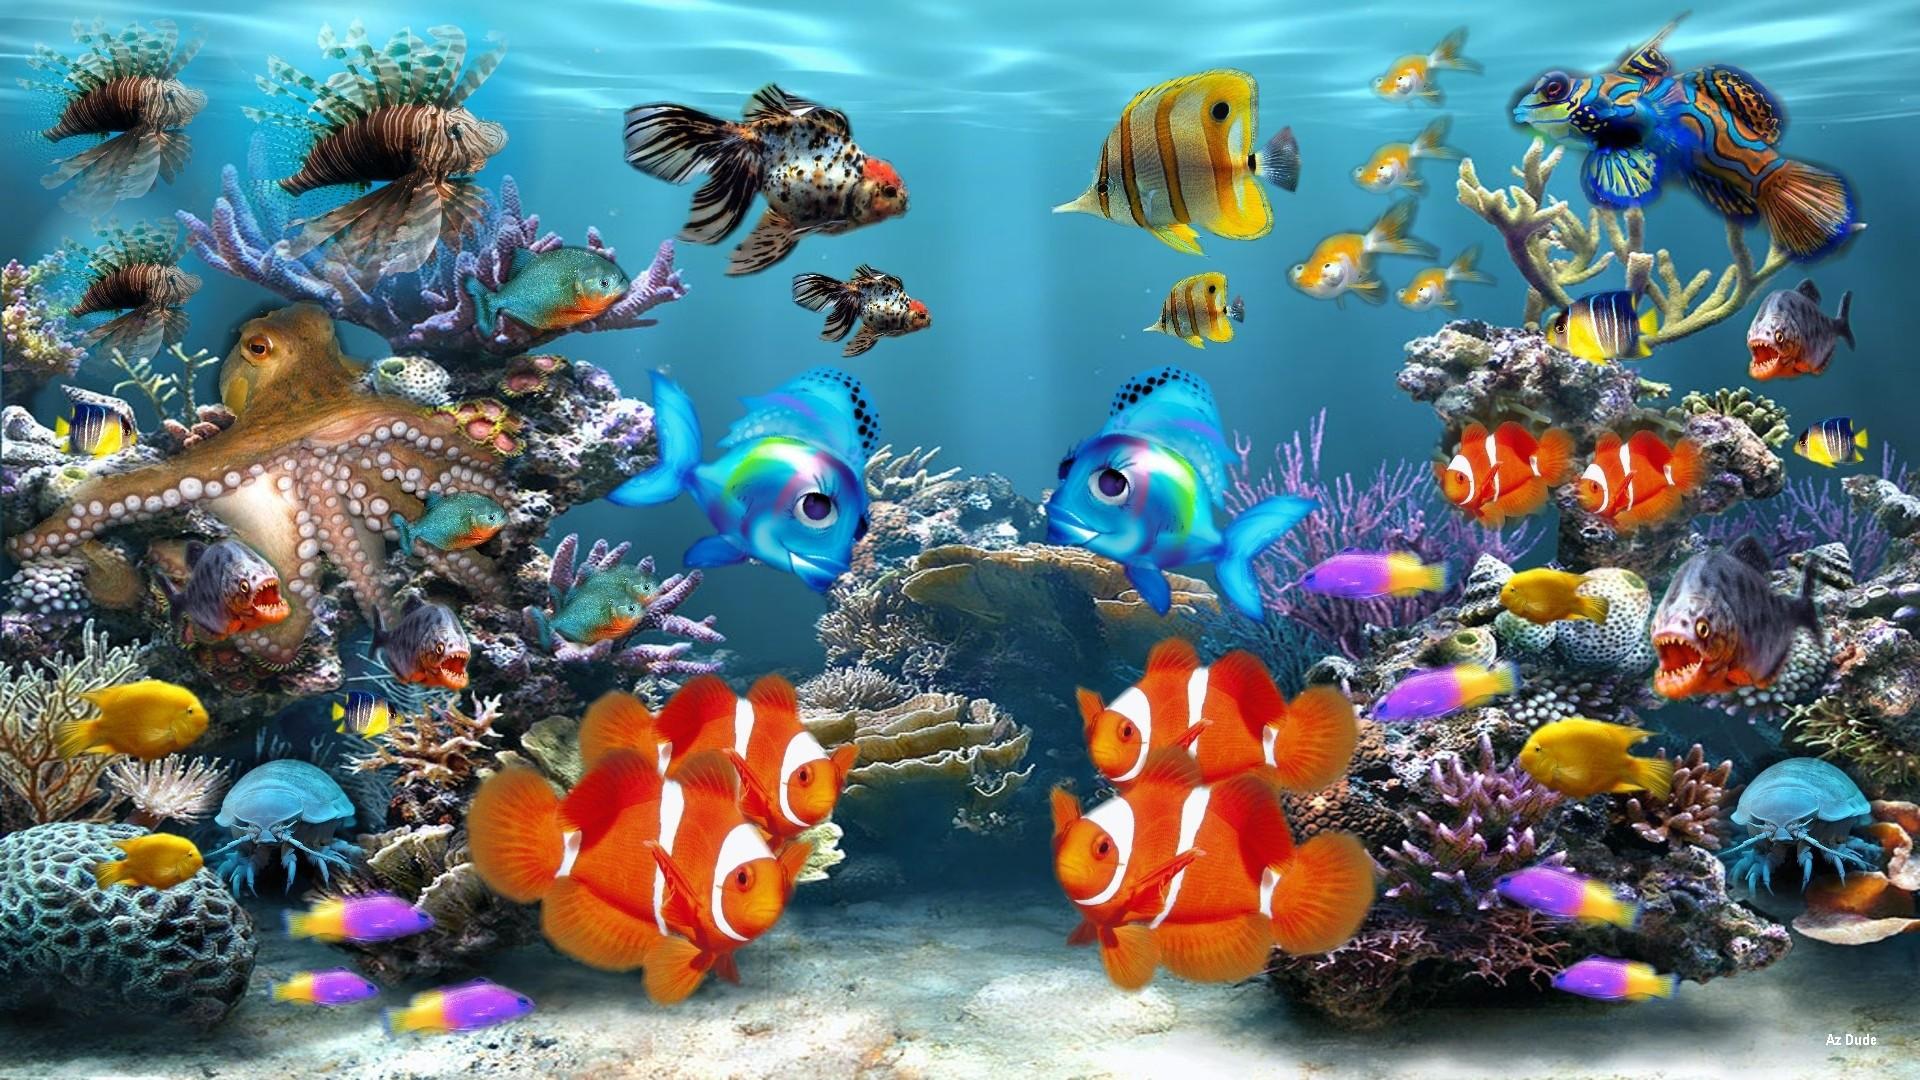 1920x1080 Hd Free Live Fish Wallpaper Moving 0 HTML Code Fonds